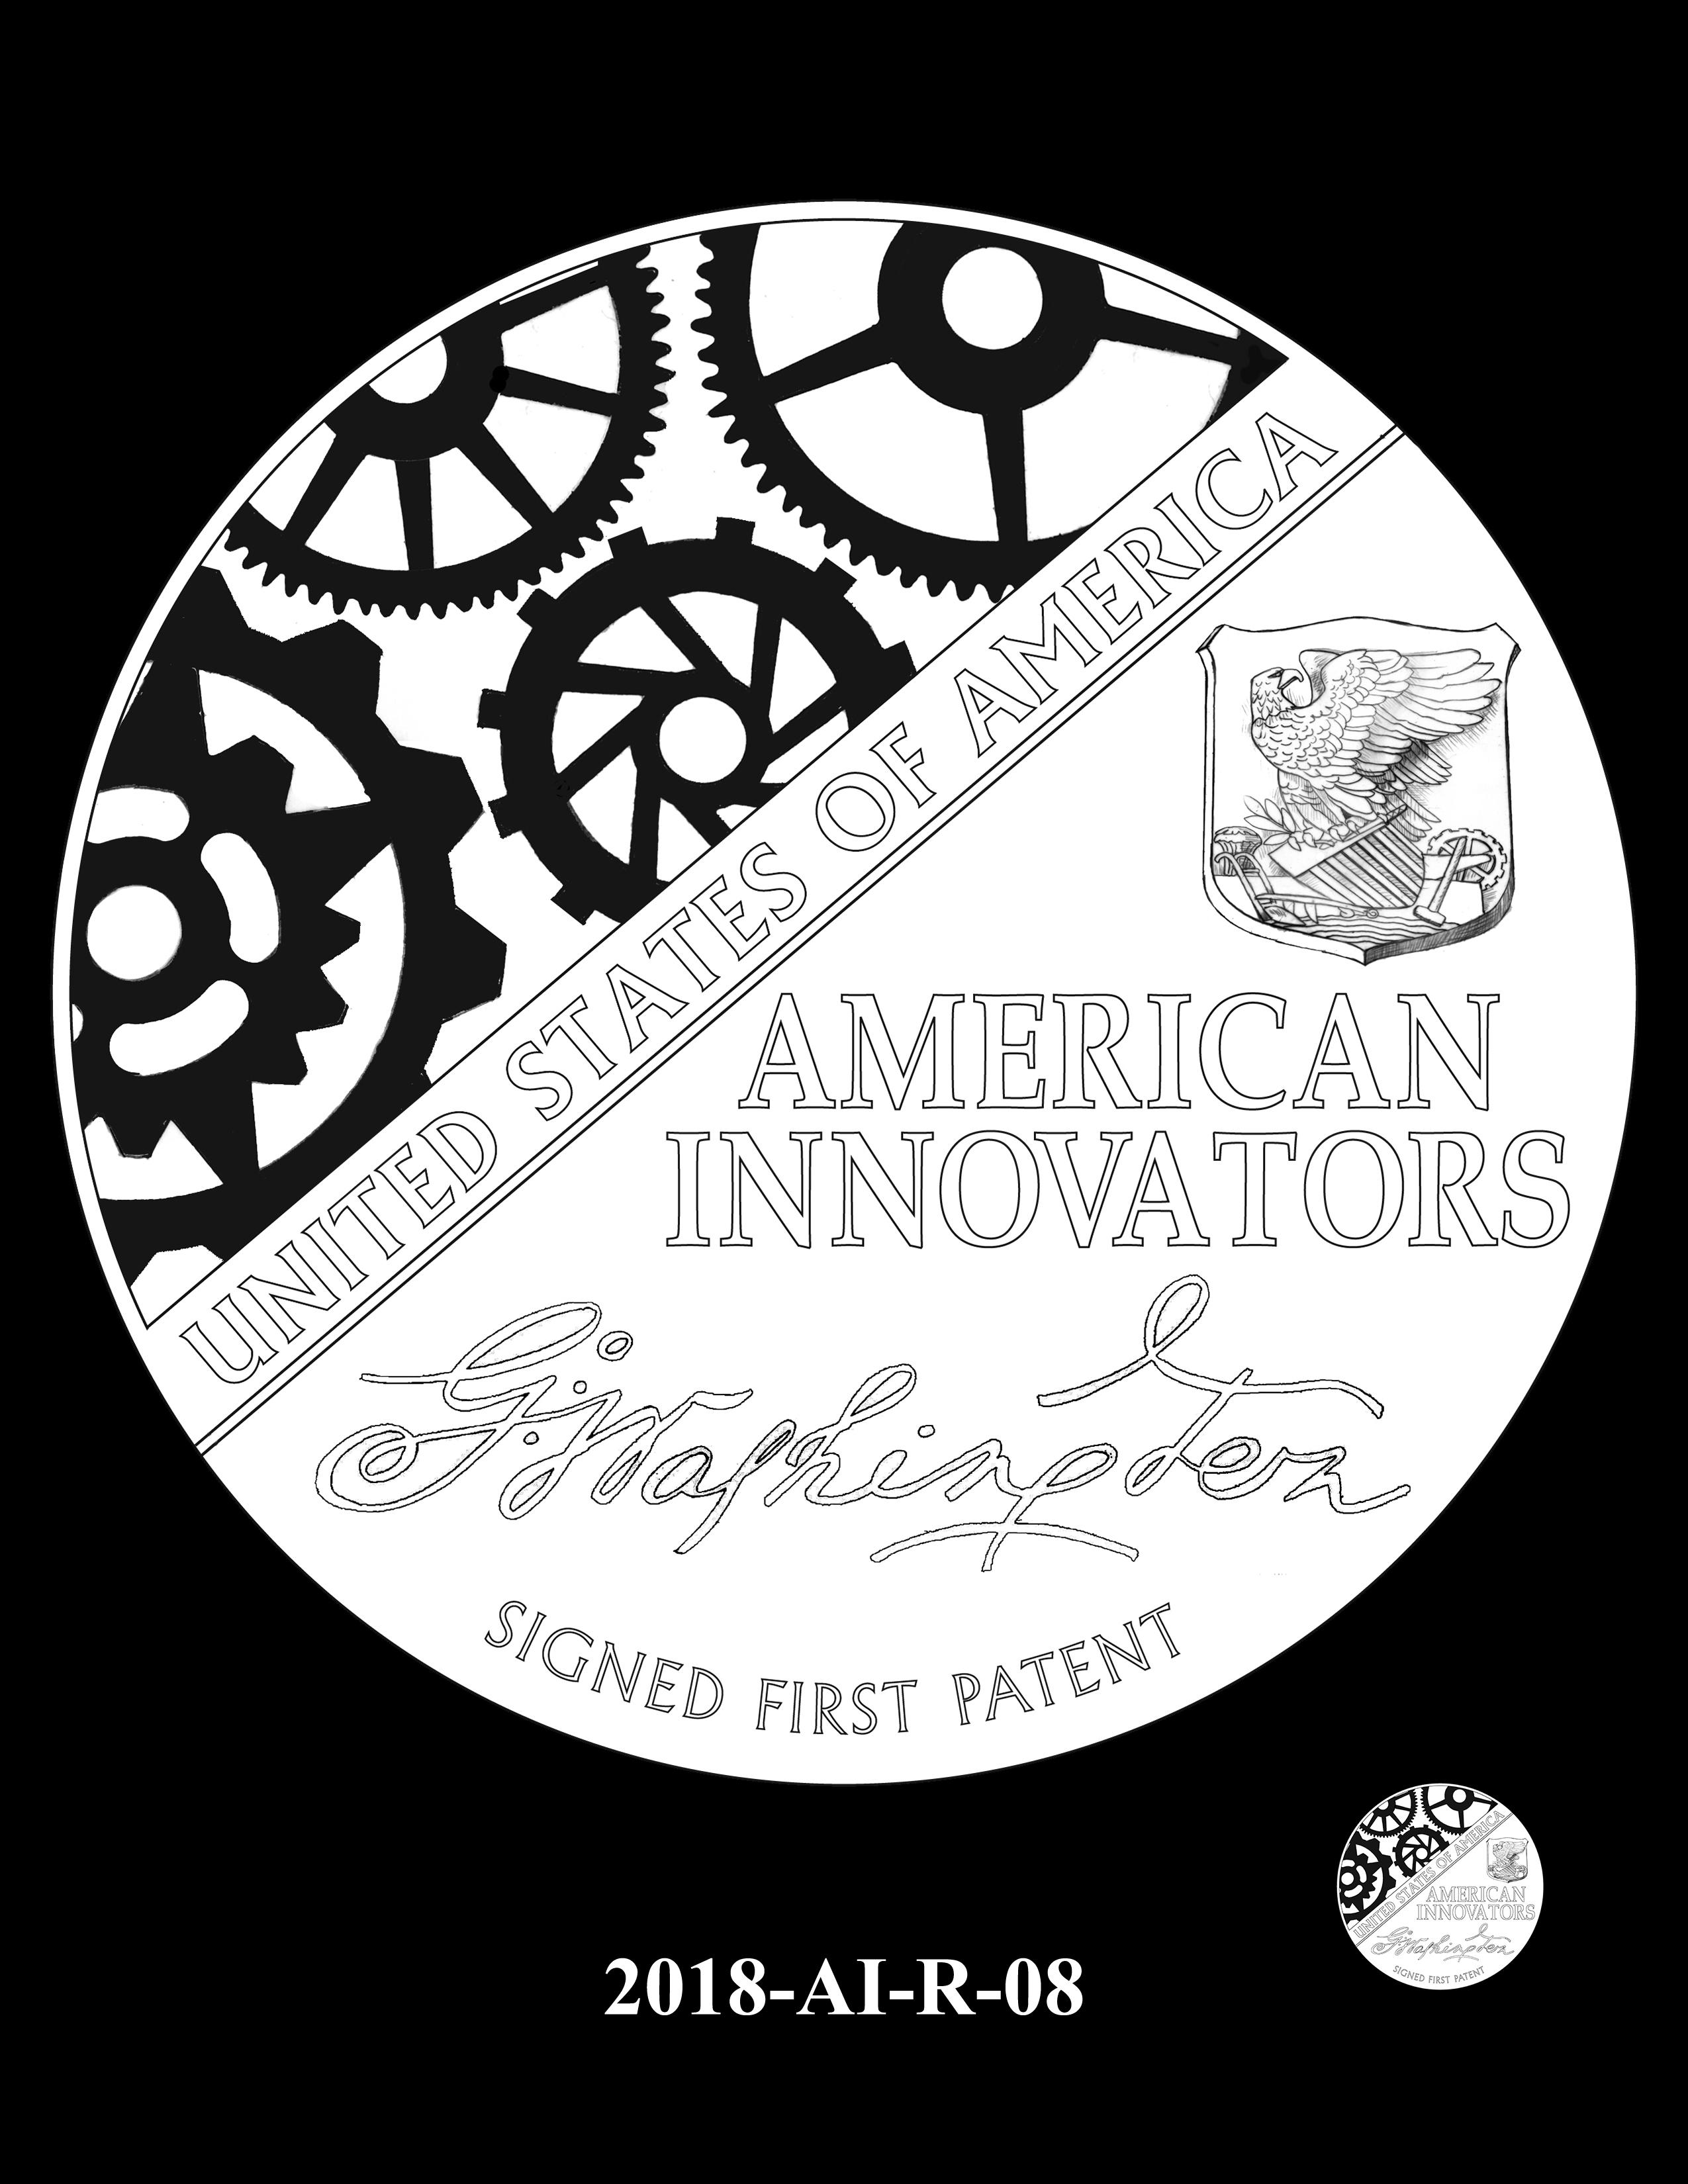 2018-AI-R-08 -- 2018 American Innovation $1 Coin